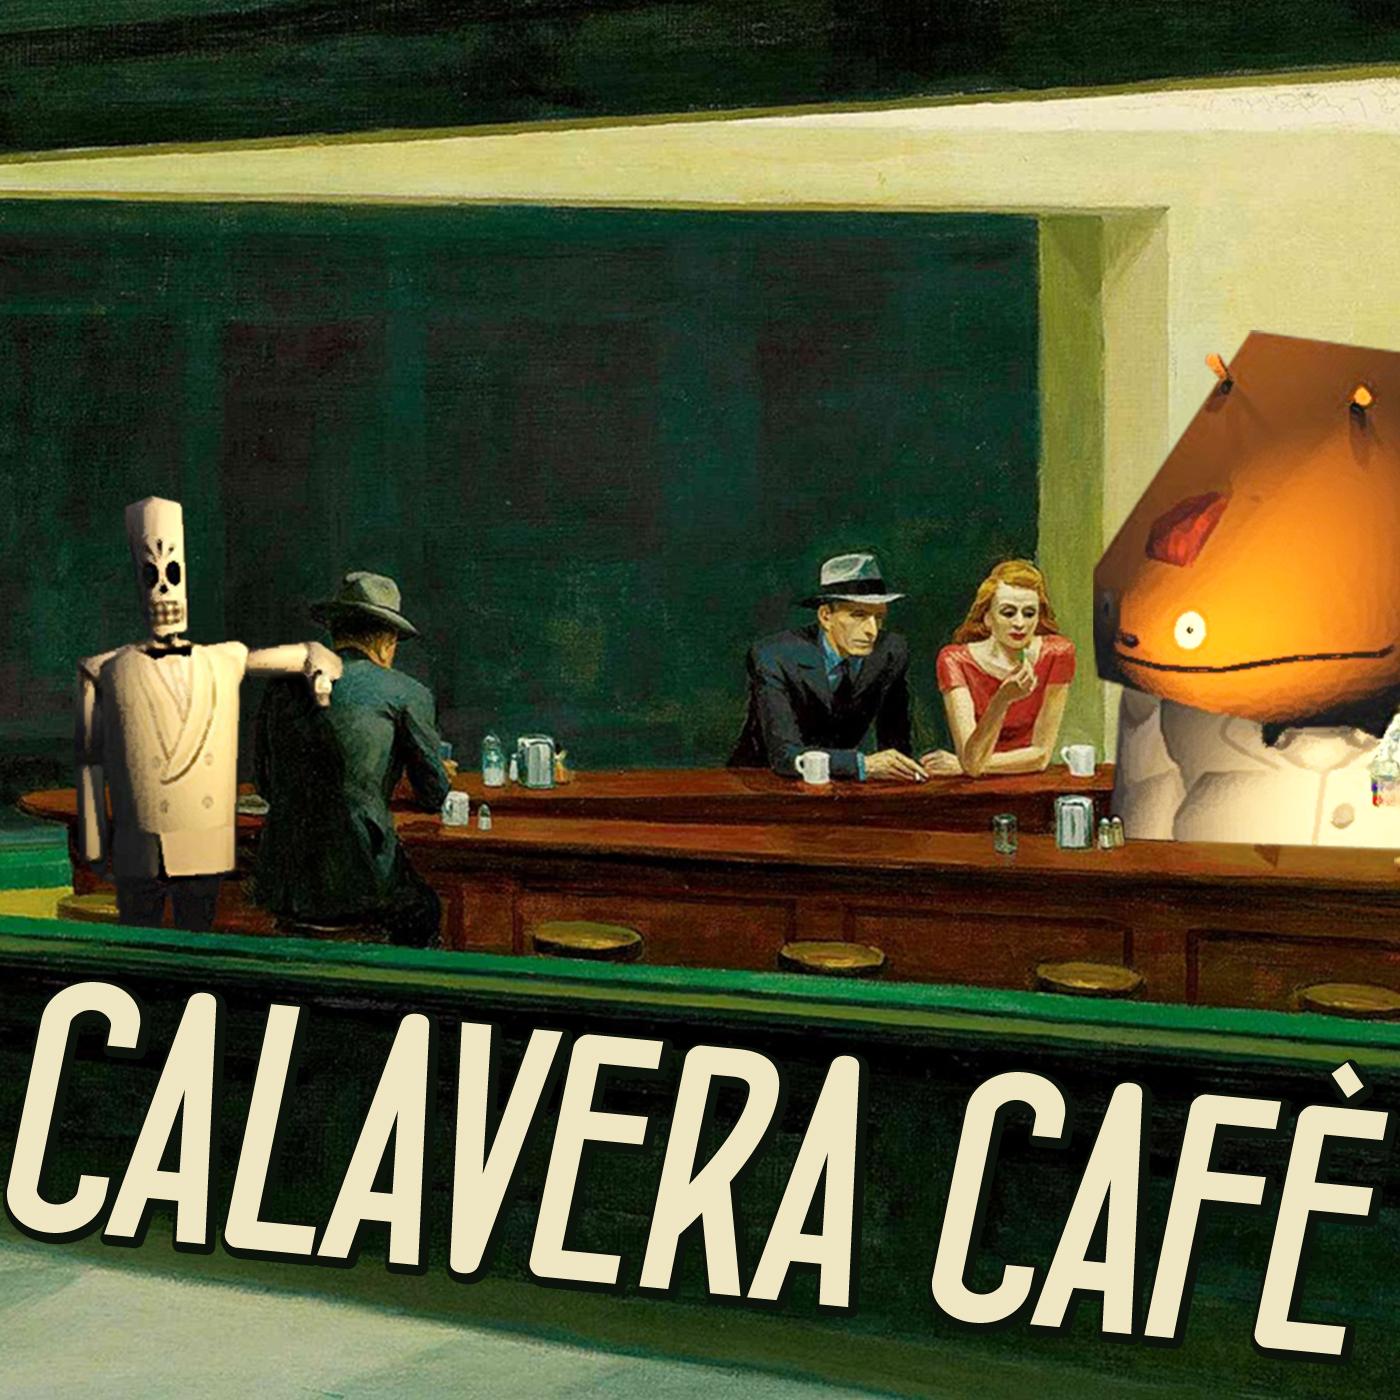 Calavera Cafè